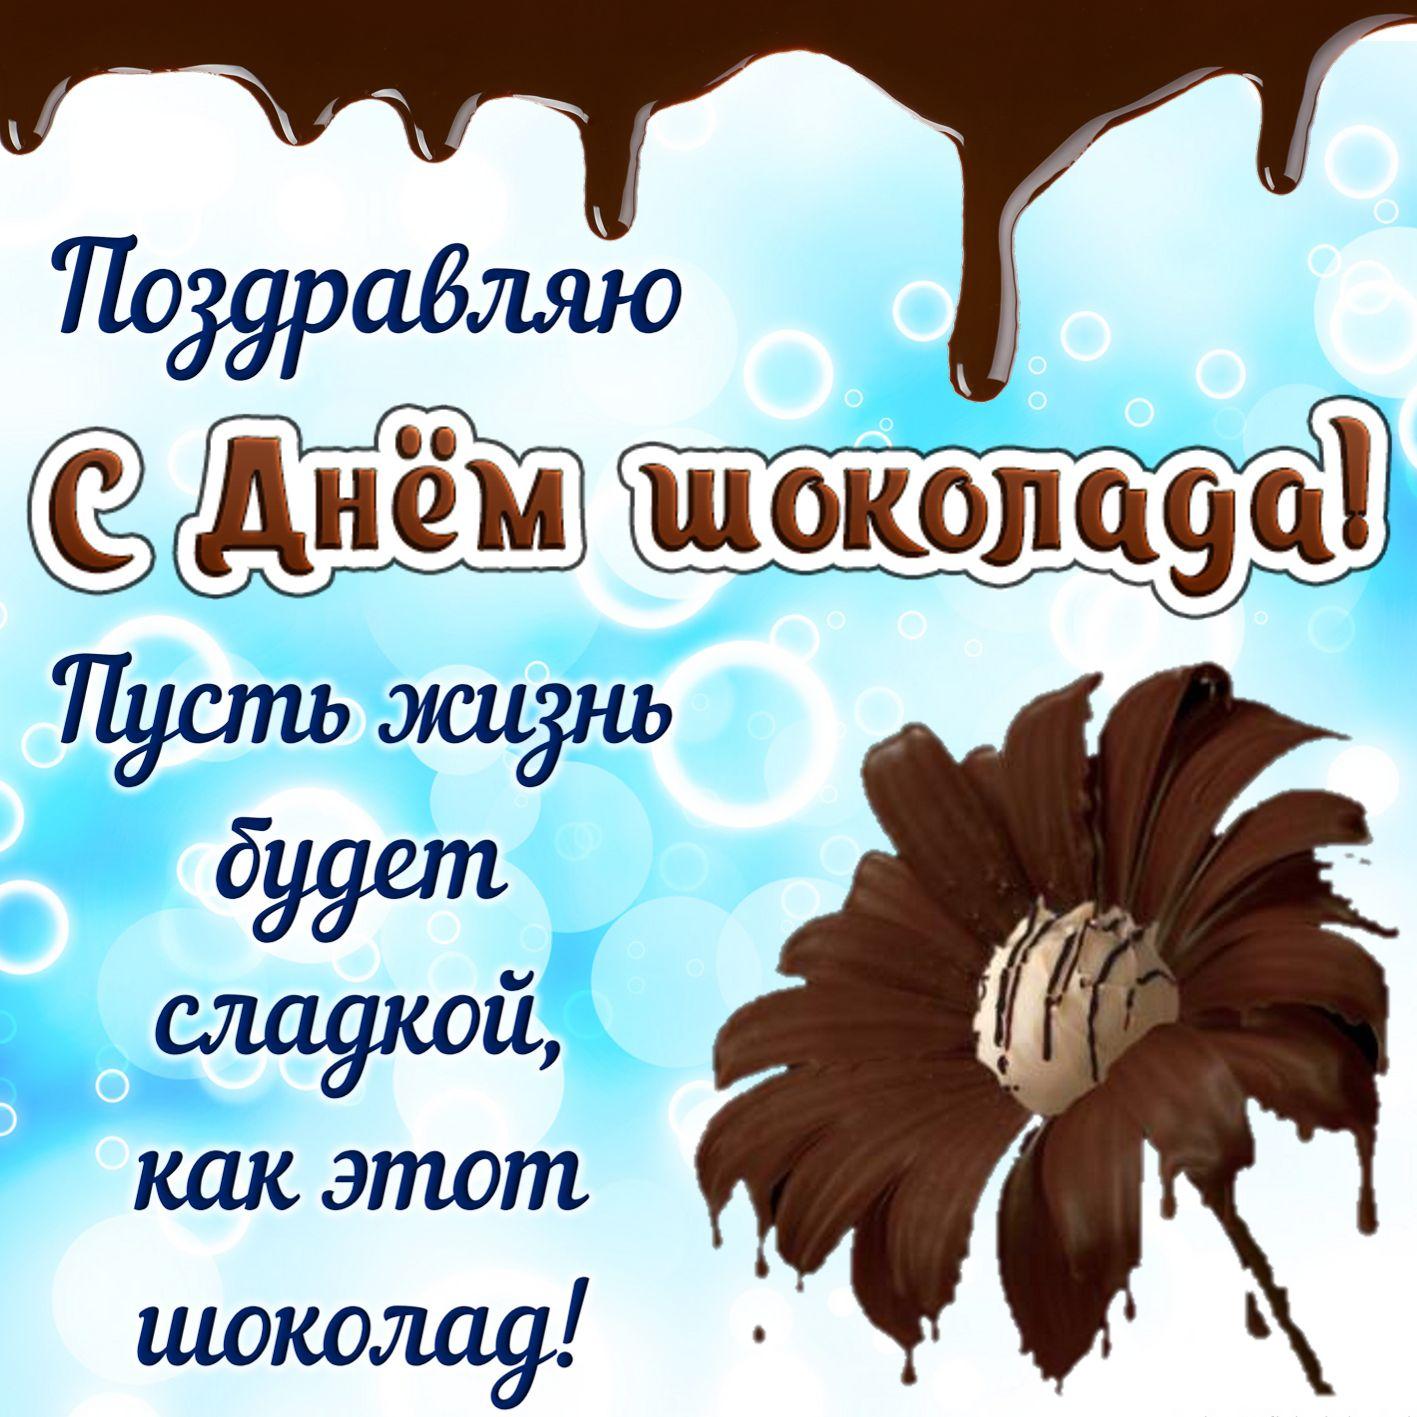 Картинки с праздником шоколада